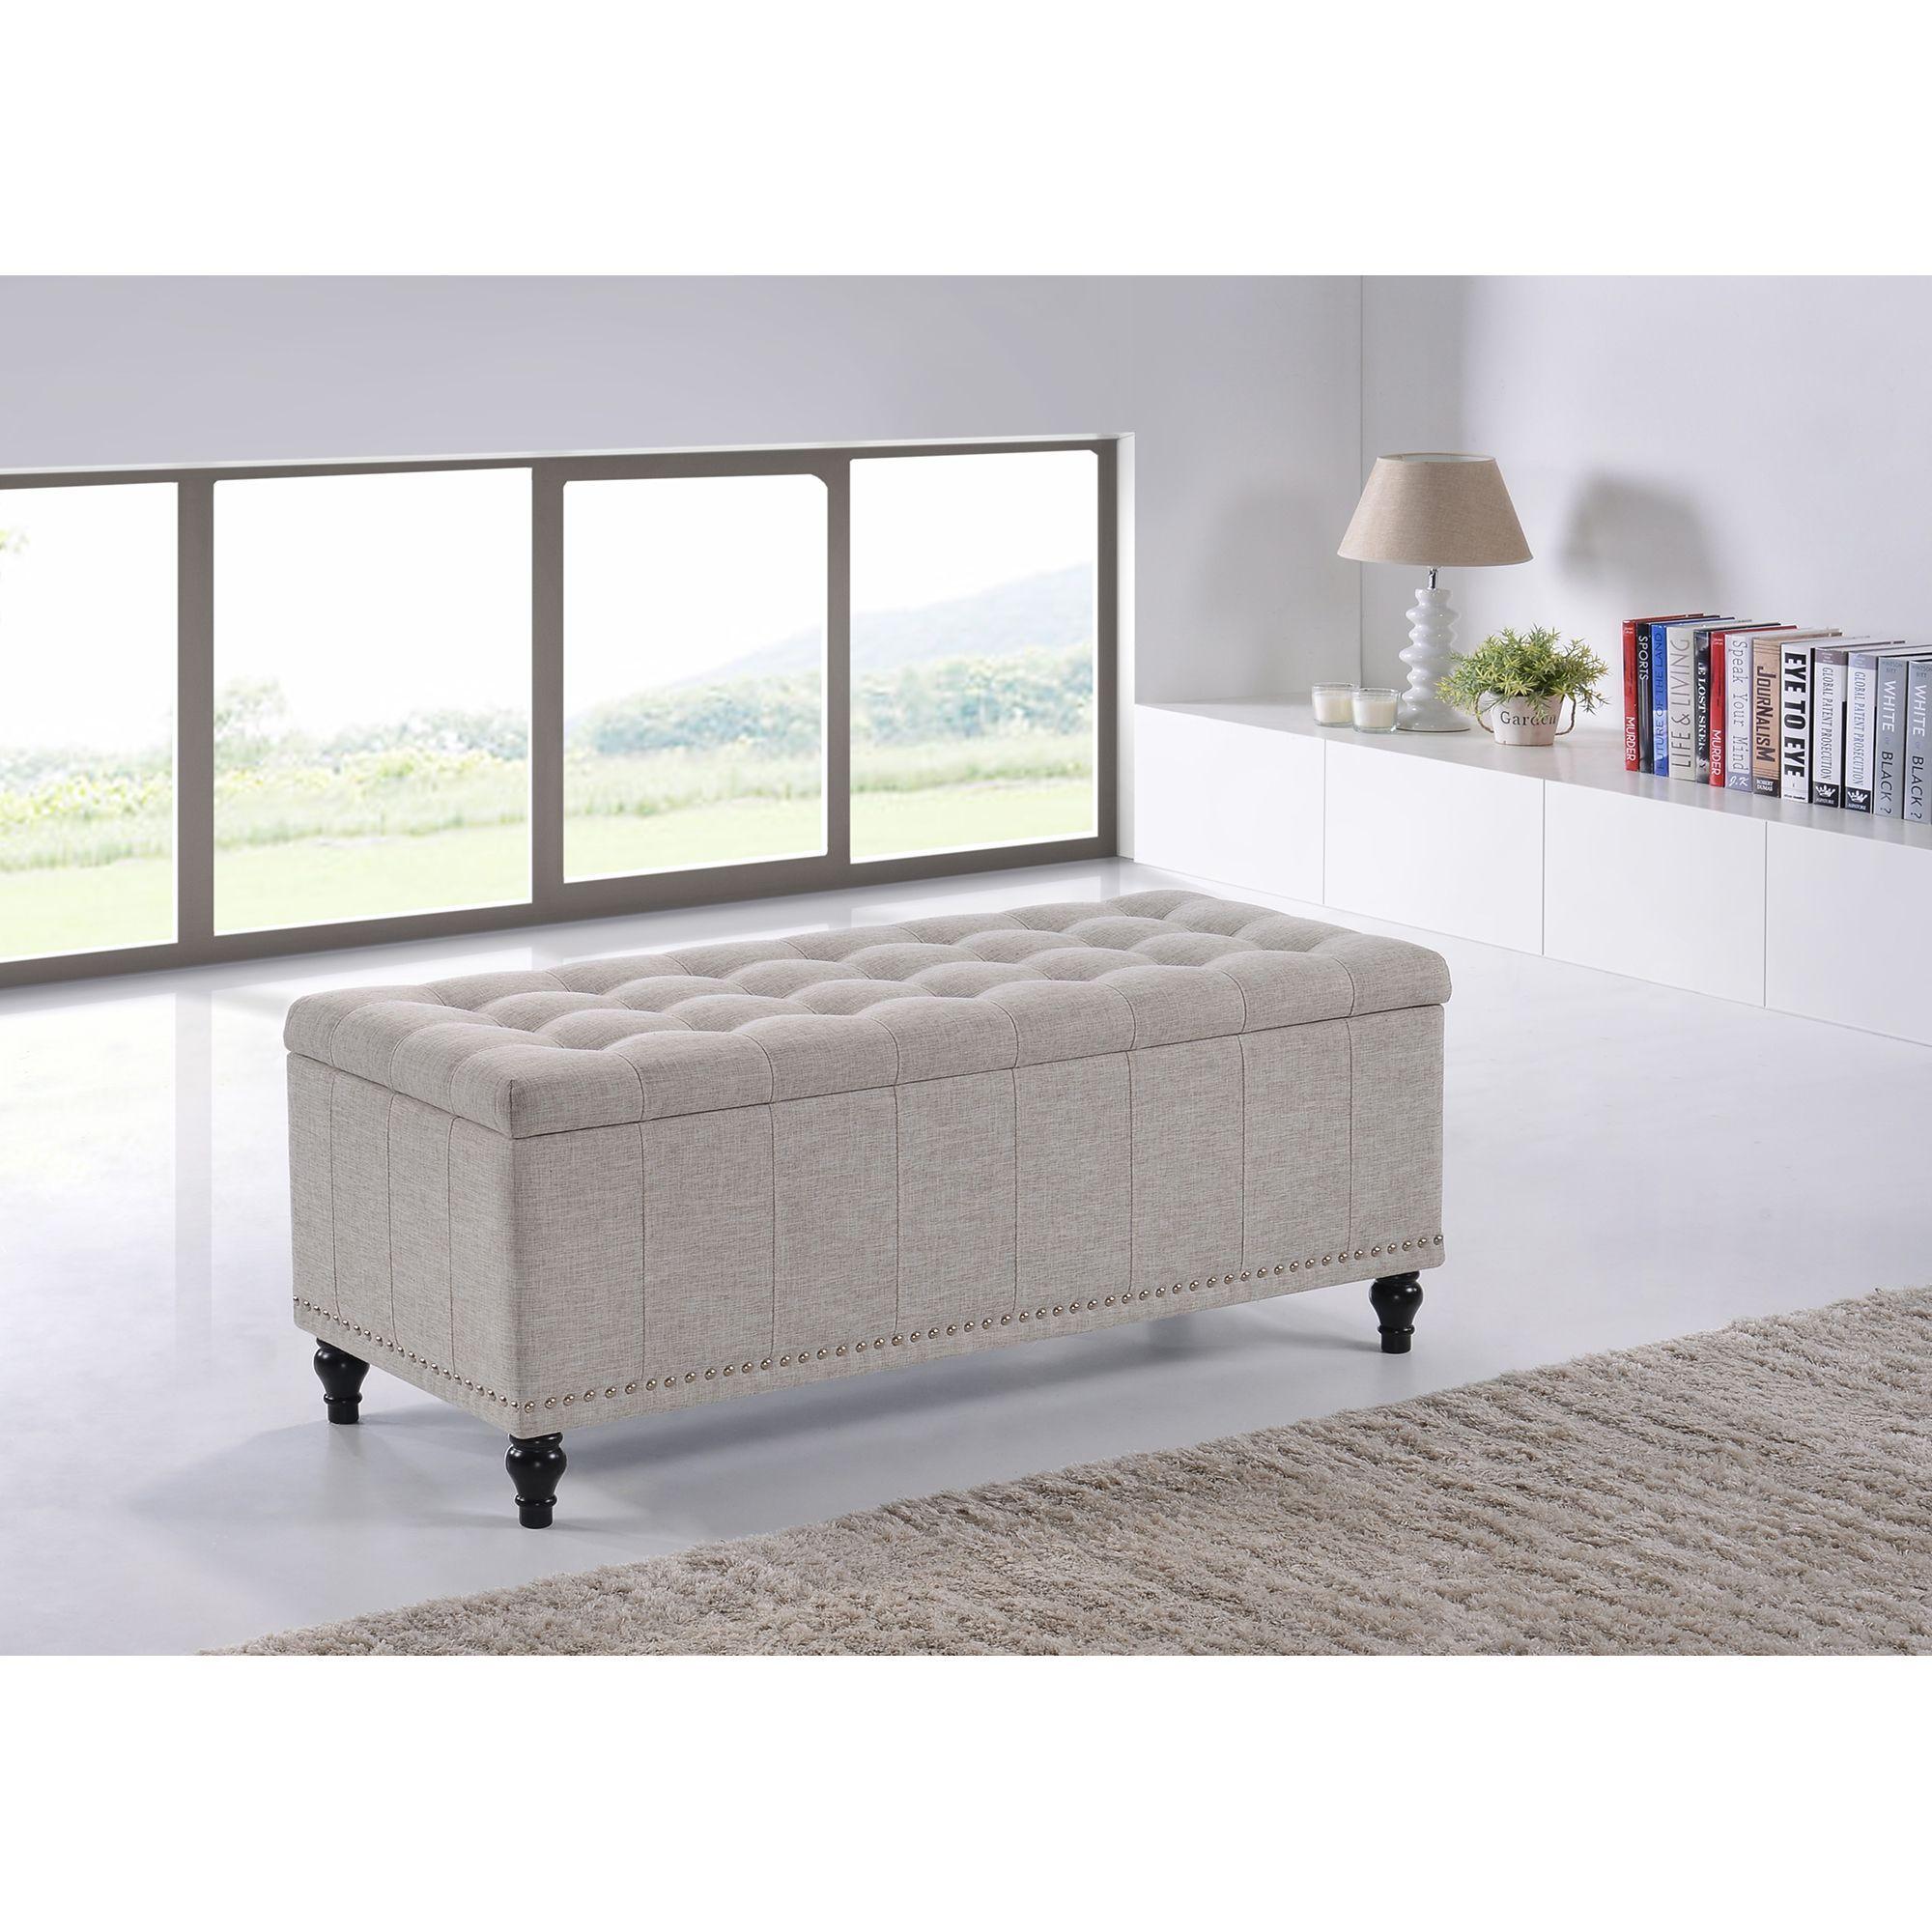 Sensational Baxton Studio Alexio Modern Classic Upholstered Button Inzonedesignstudio Interior Chair Design Inzonedesignstudiocom